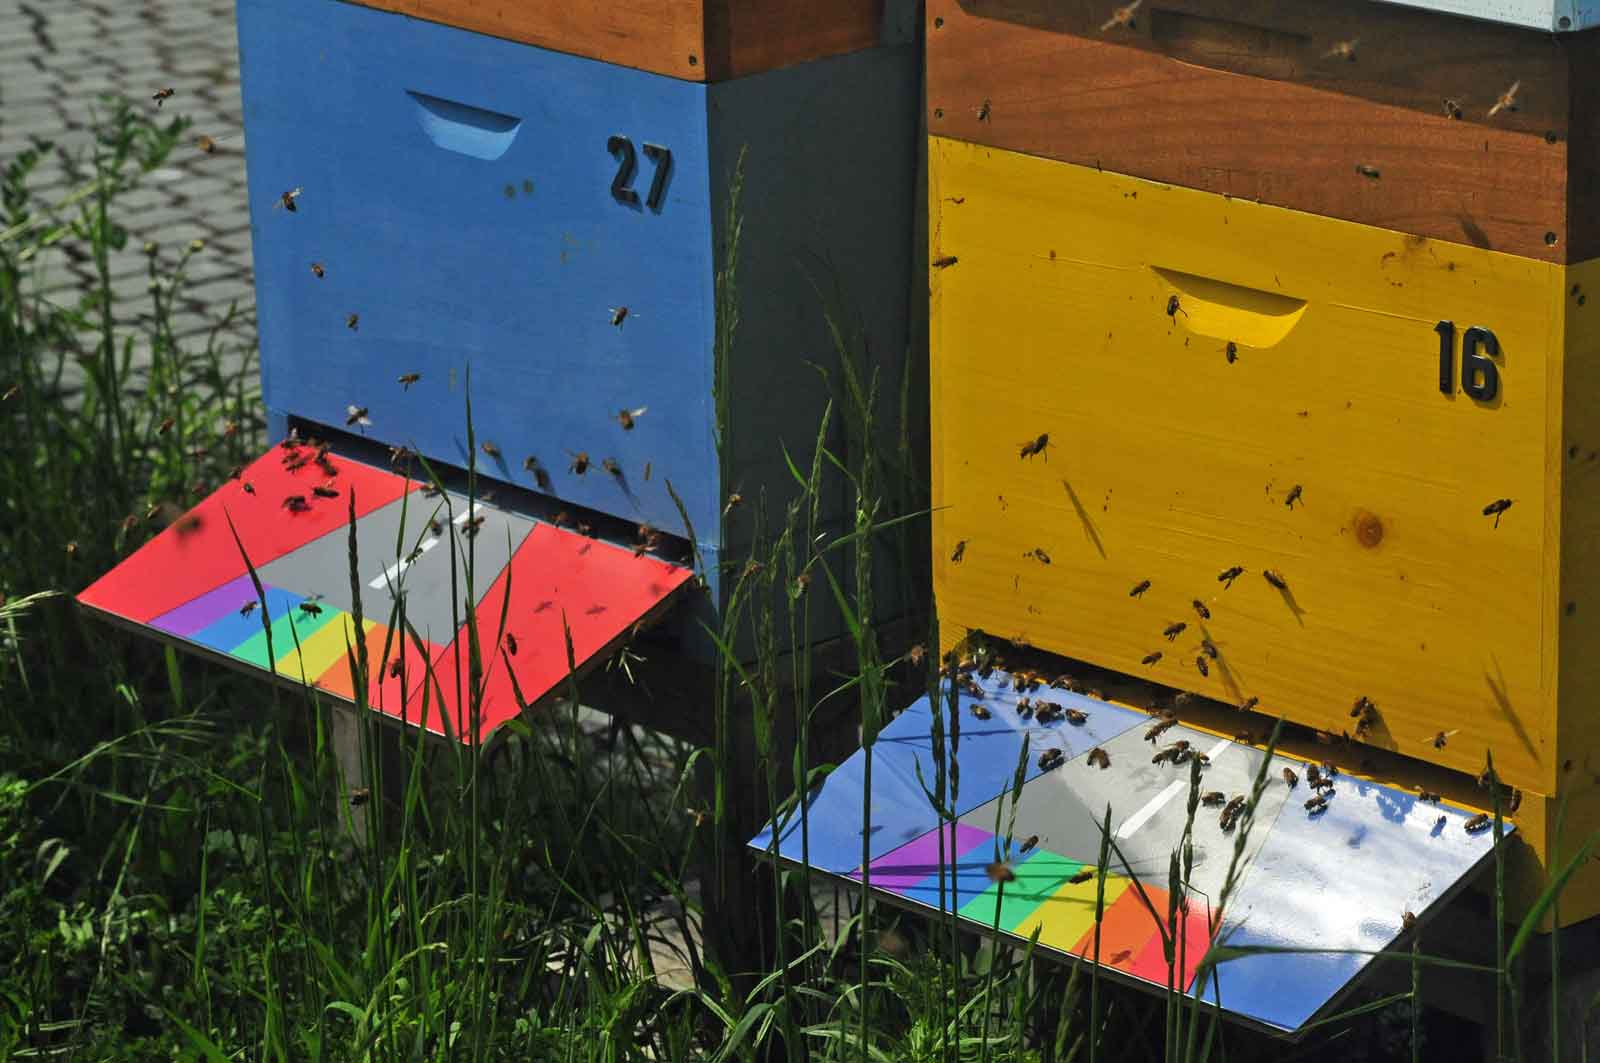 Die Bienenvölker auf dem Dachgarten der Bundeskunsthalle in Bonn haben Anflugbretter mit der Regenbogenflagge, dem Symbol der Gay Community.